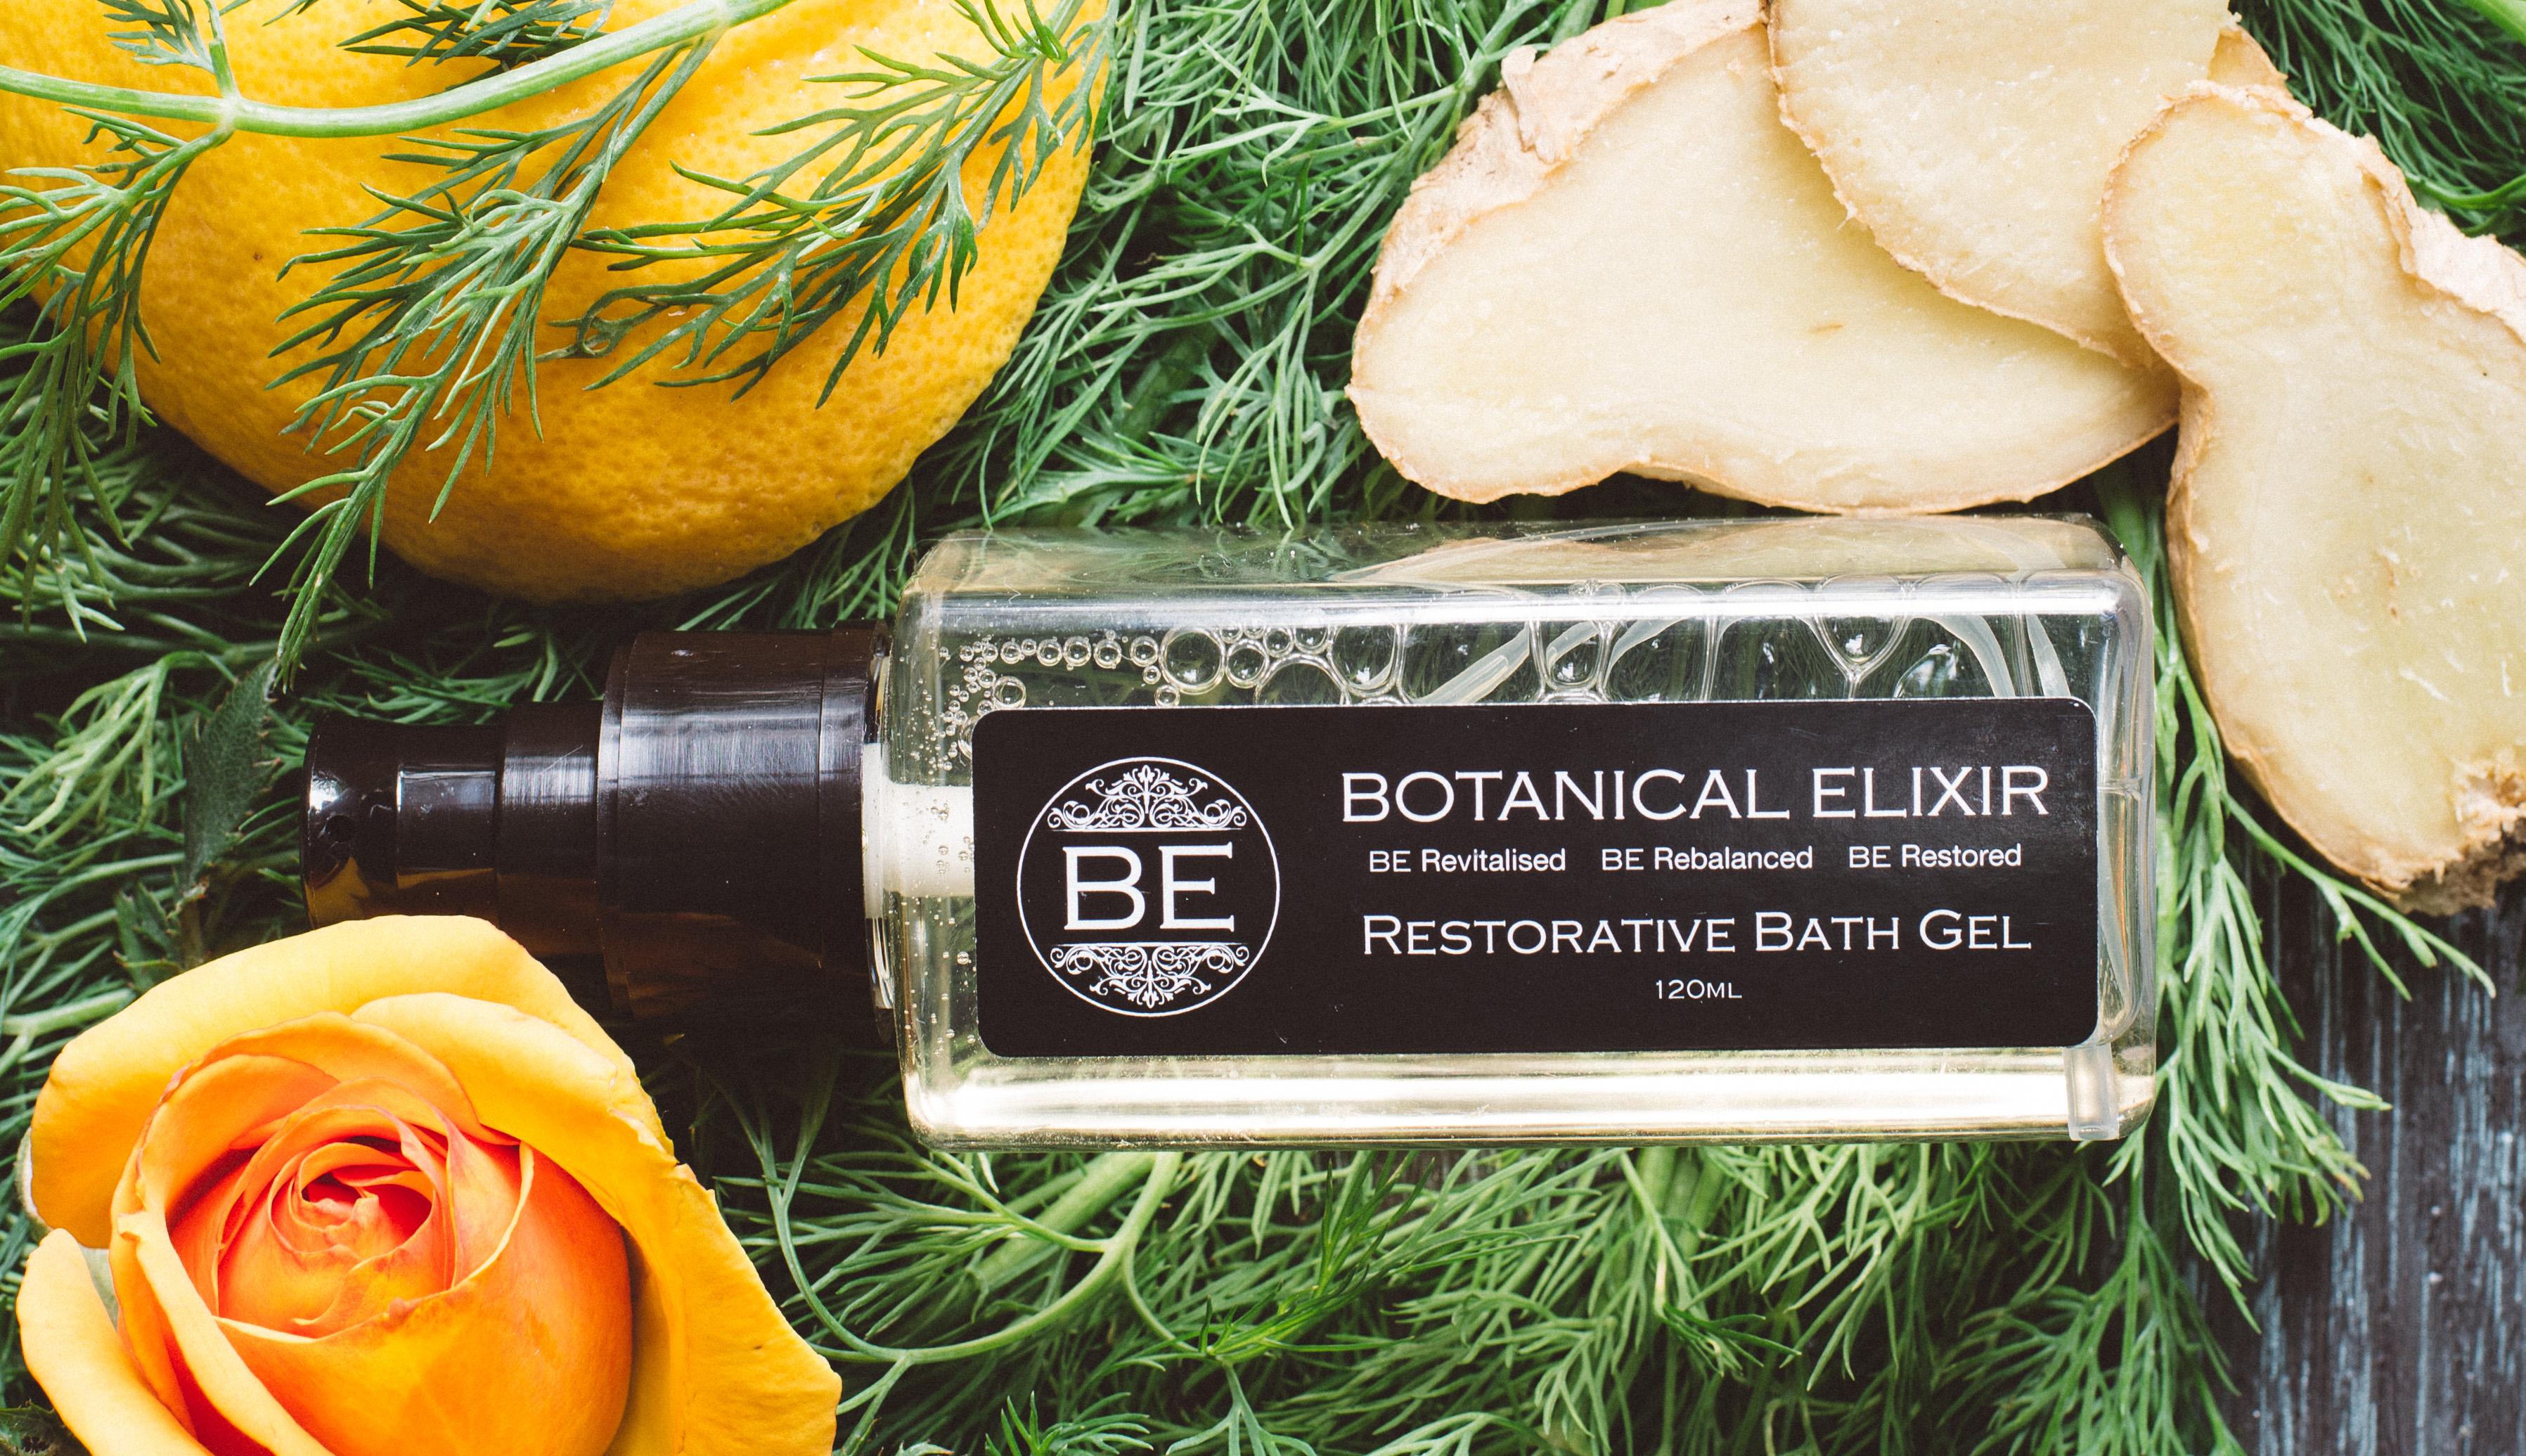 RESTORATIVE BATH GEL